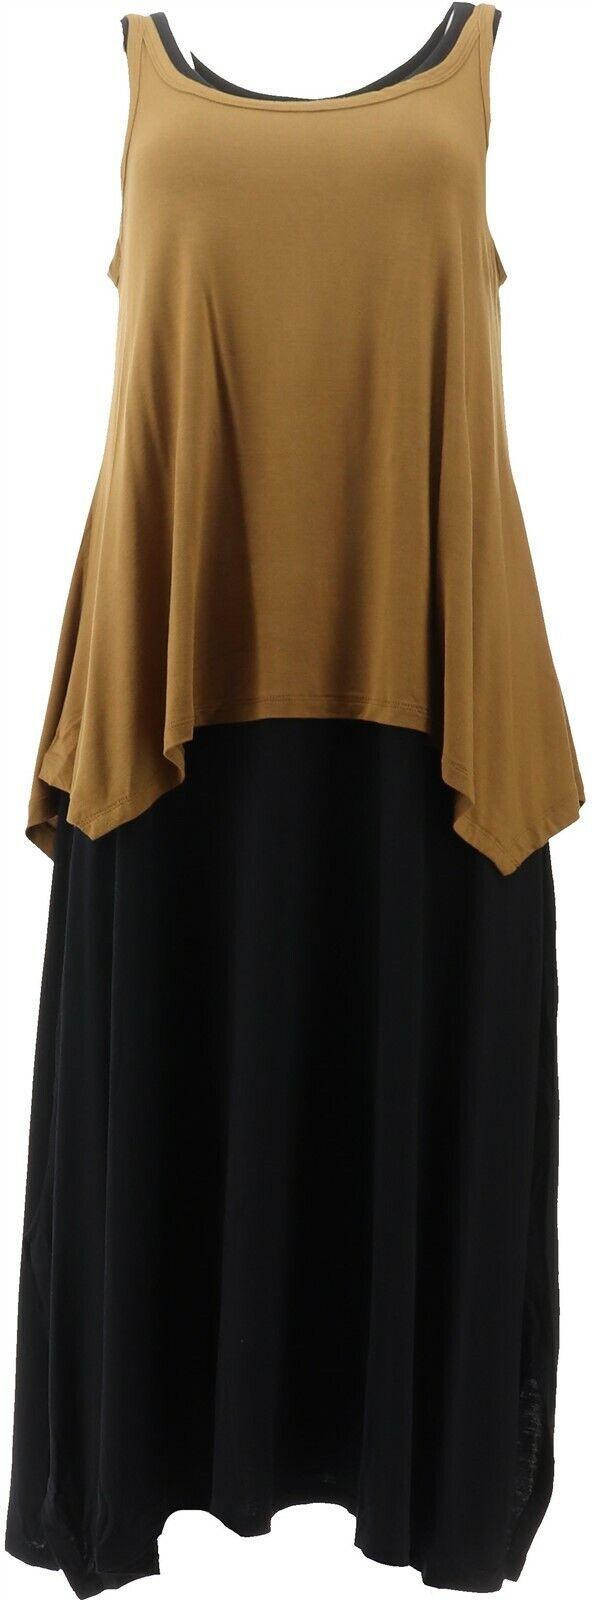 AnyBody Loungewear Short Slv Split Back Tee Indigo Floral XL NEW A302305